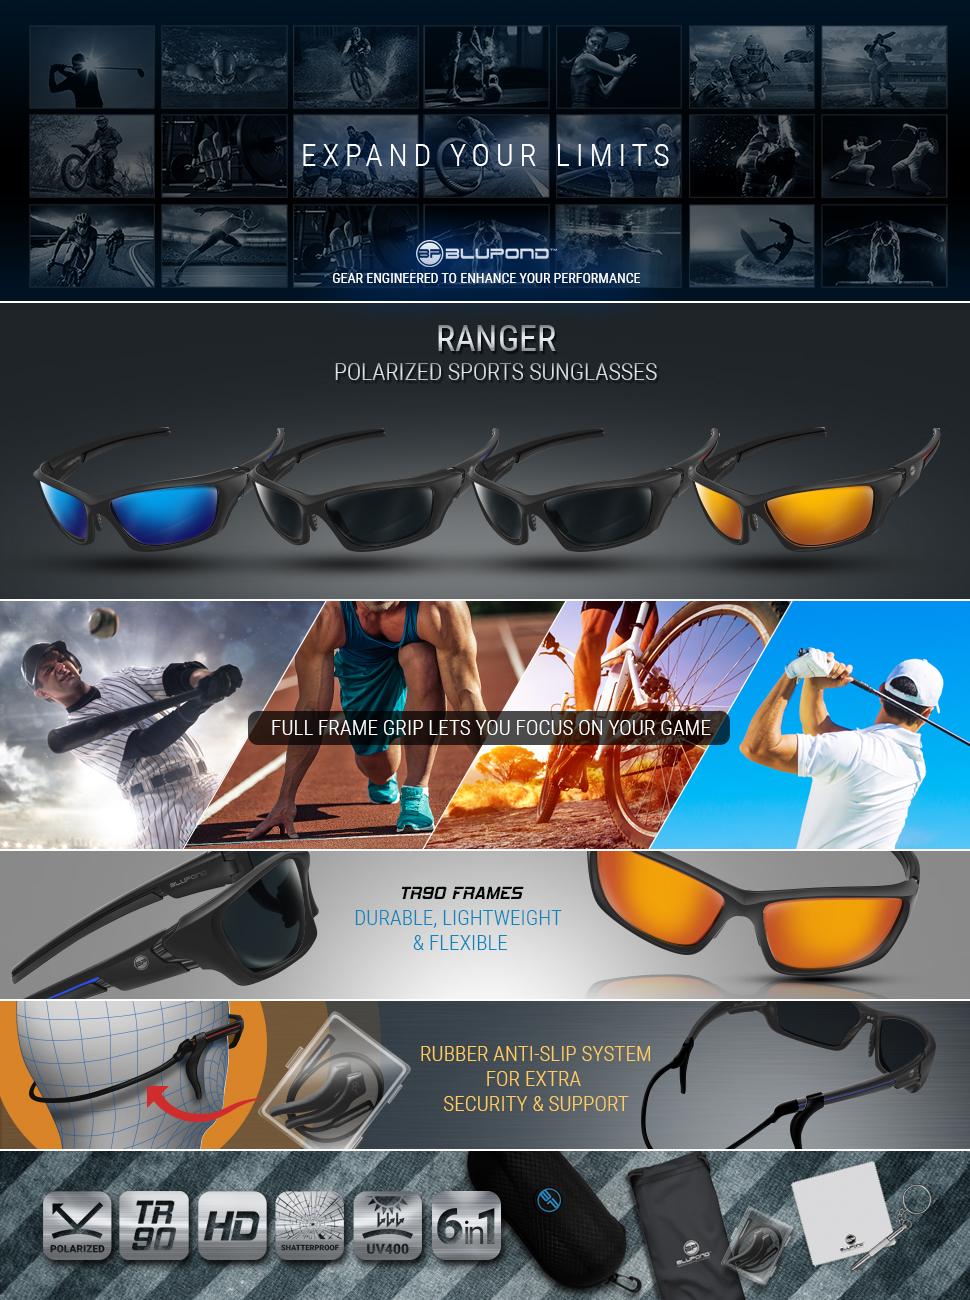 87b929c4819 Amazon.com   BLUPOND Polarized Sports Sunglasses for Men - TR90 ...